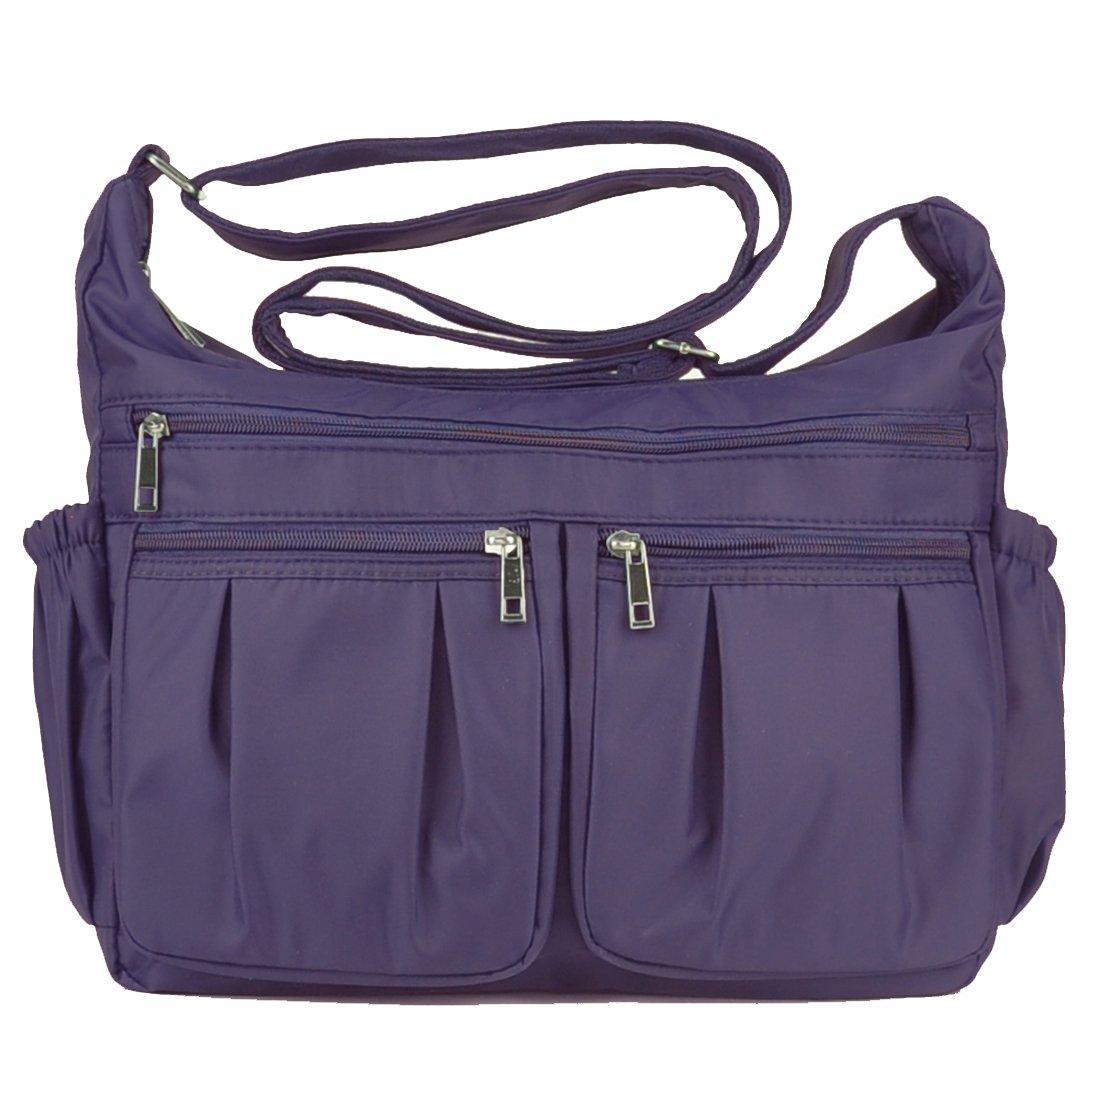 Volcanic Rock Shoulder Bag Corss-body Purse Waterproof Nylon Handbags with Zipper for Women(8981_Purple-Large)